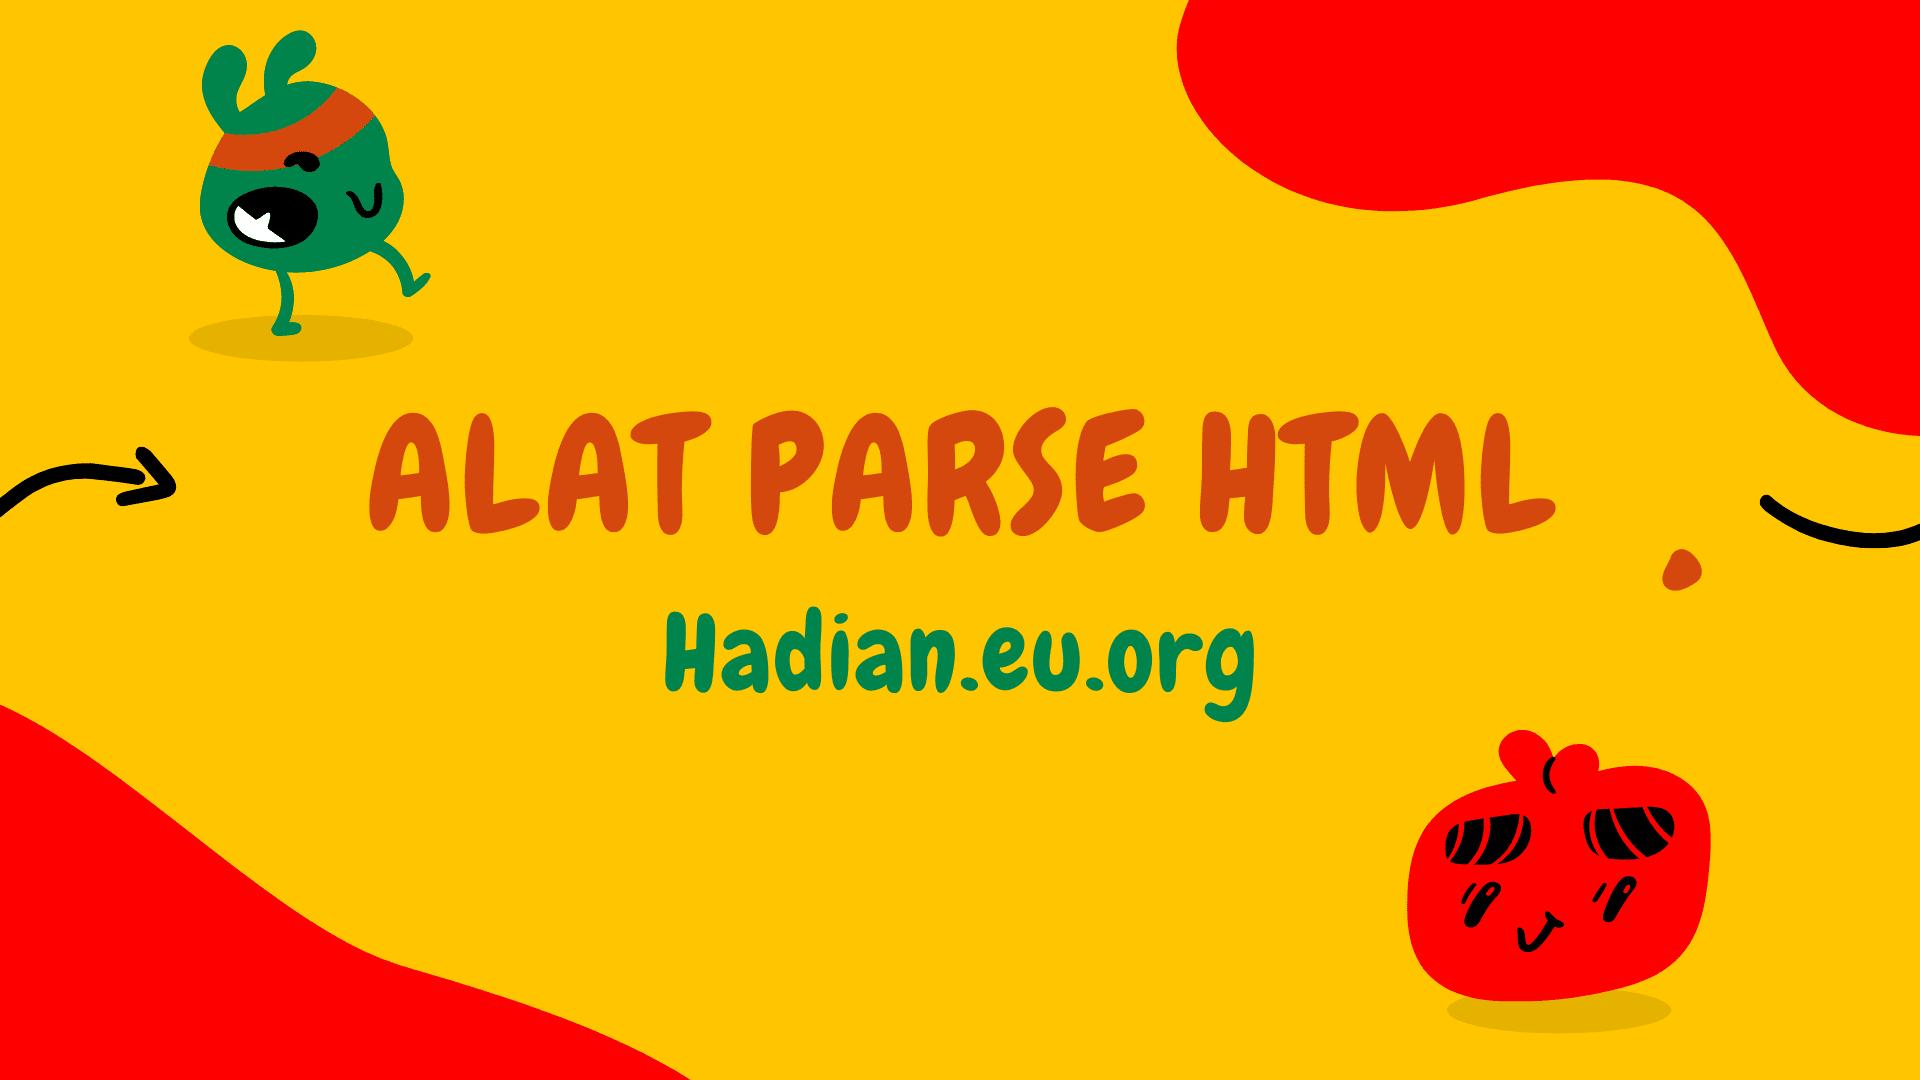 Alat parse html